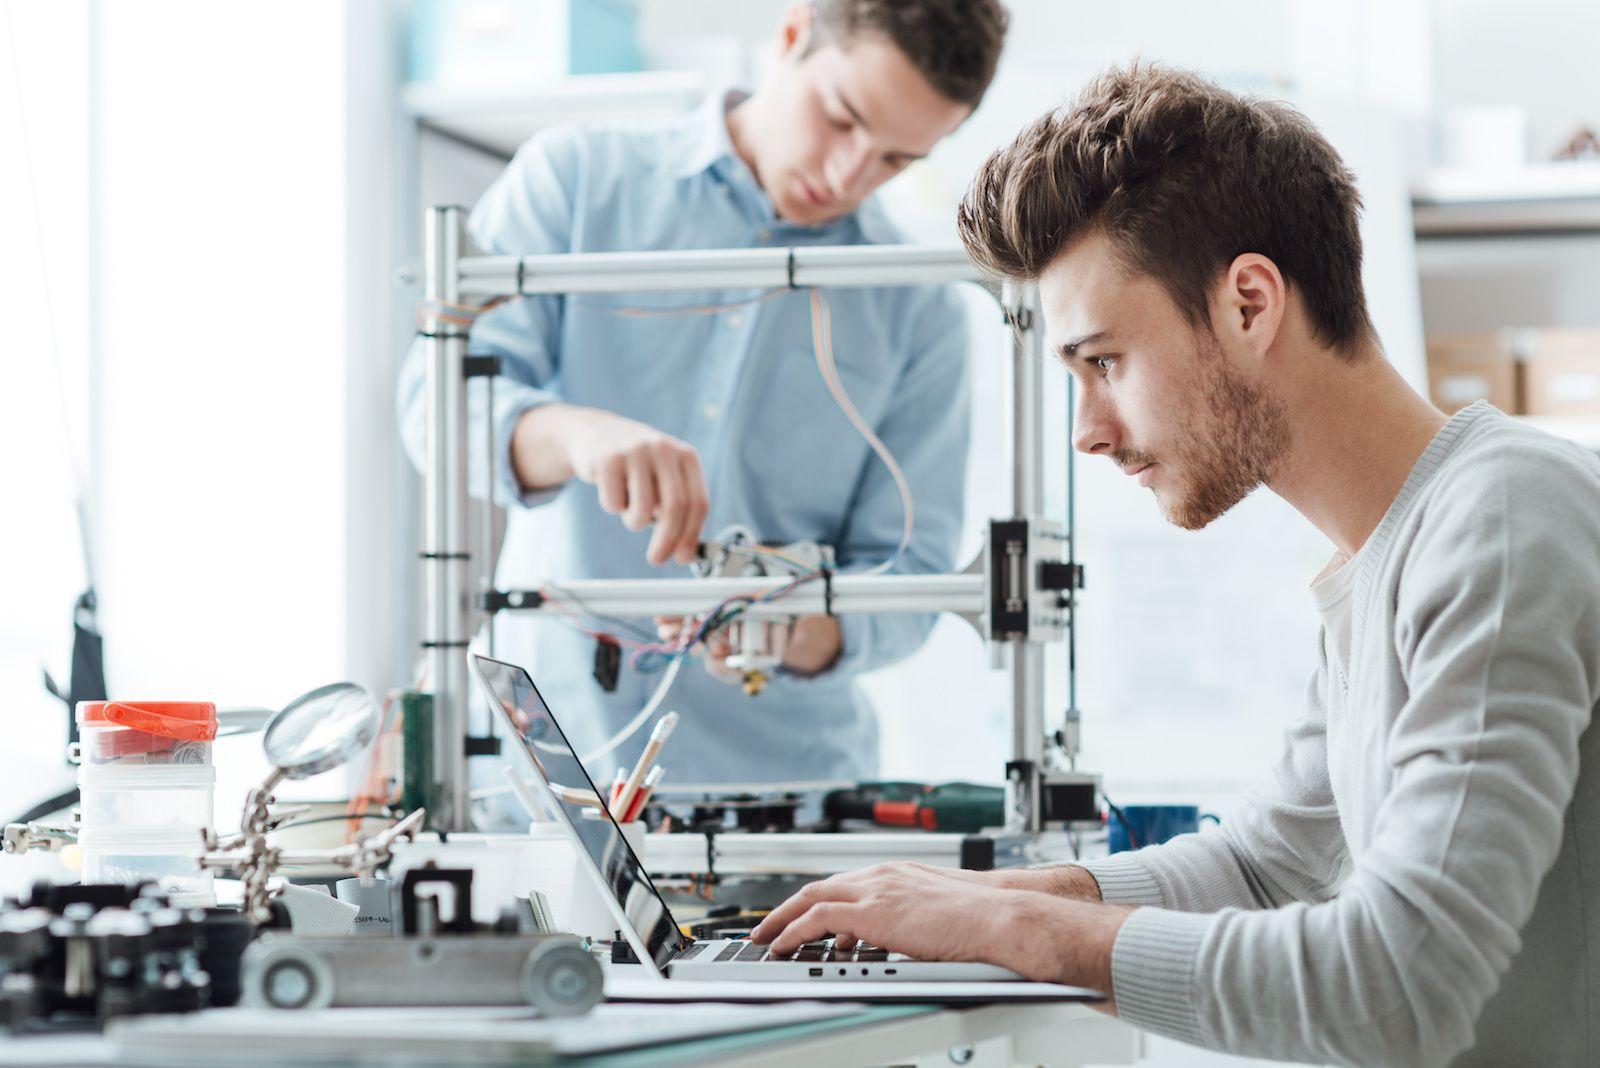 AdobeStock_102717457 Engineering student, Engineering